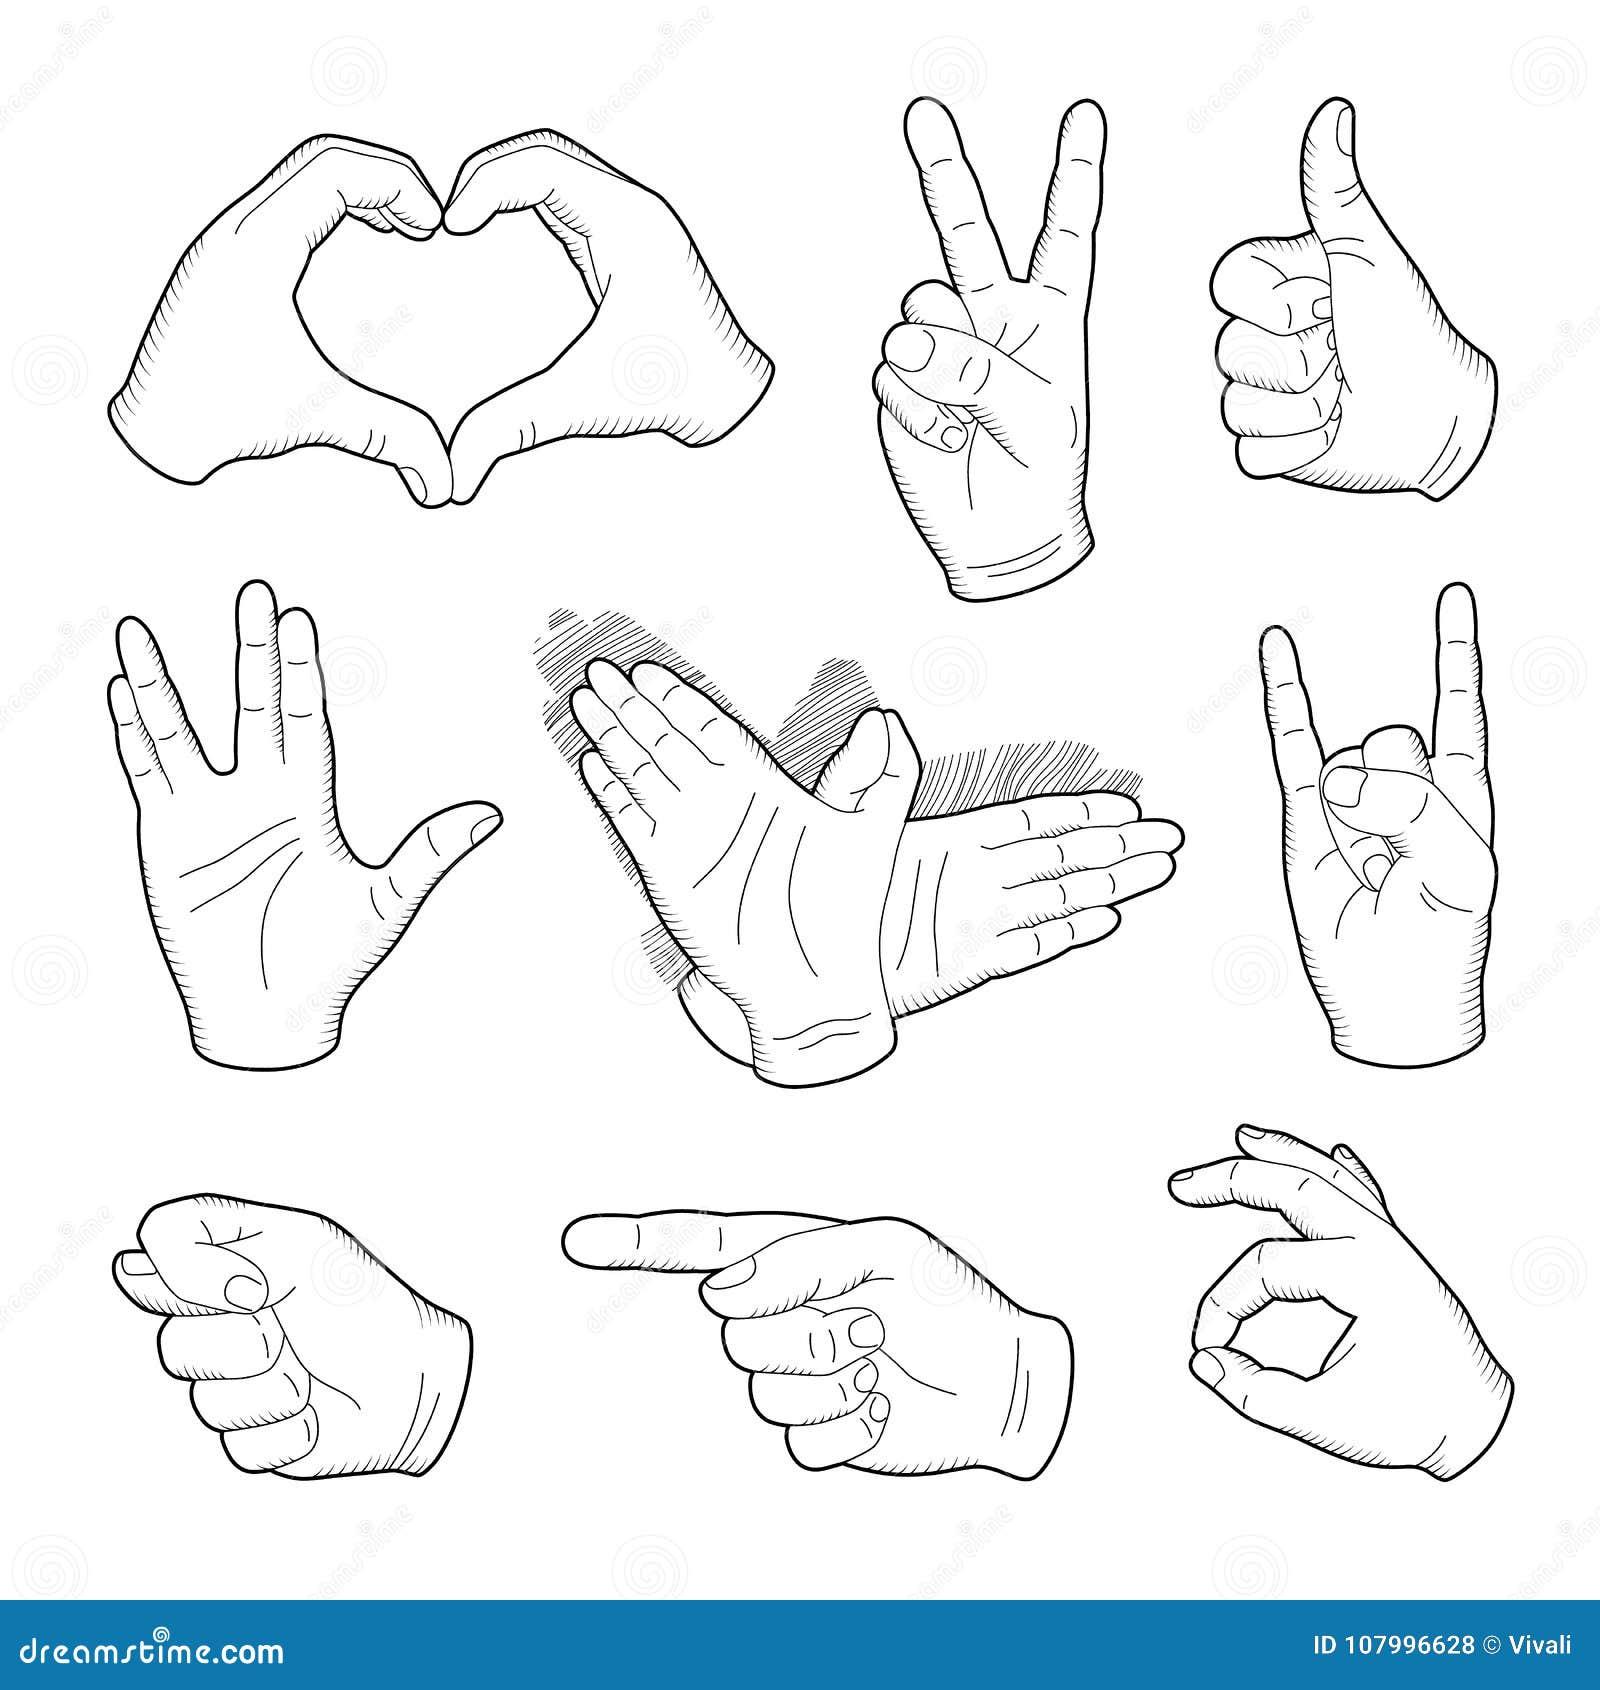 Dessin humain de main de vintage avec diriger le doigt le - Dessin de la main ...